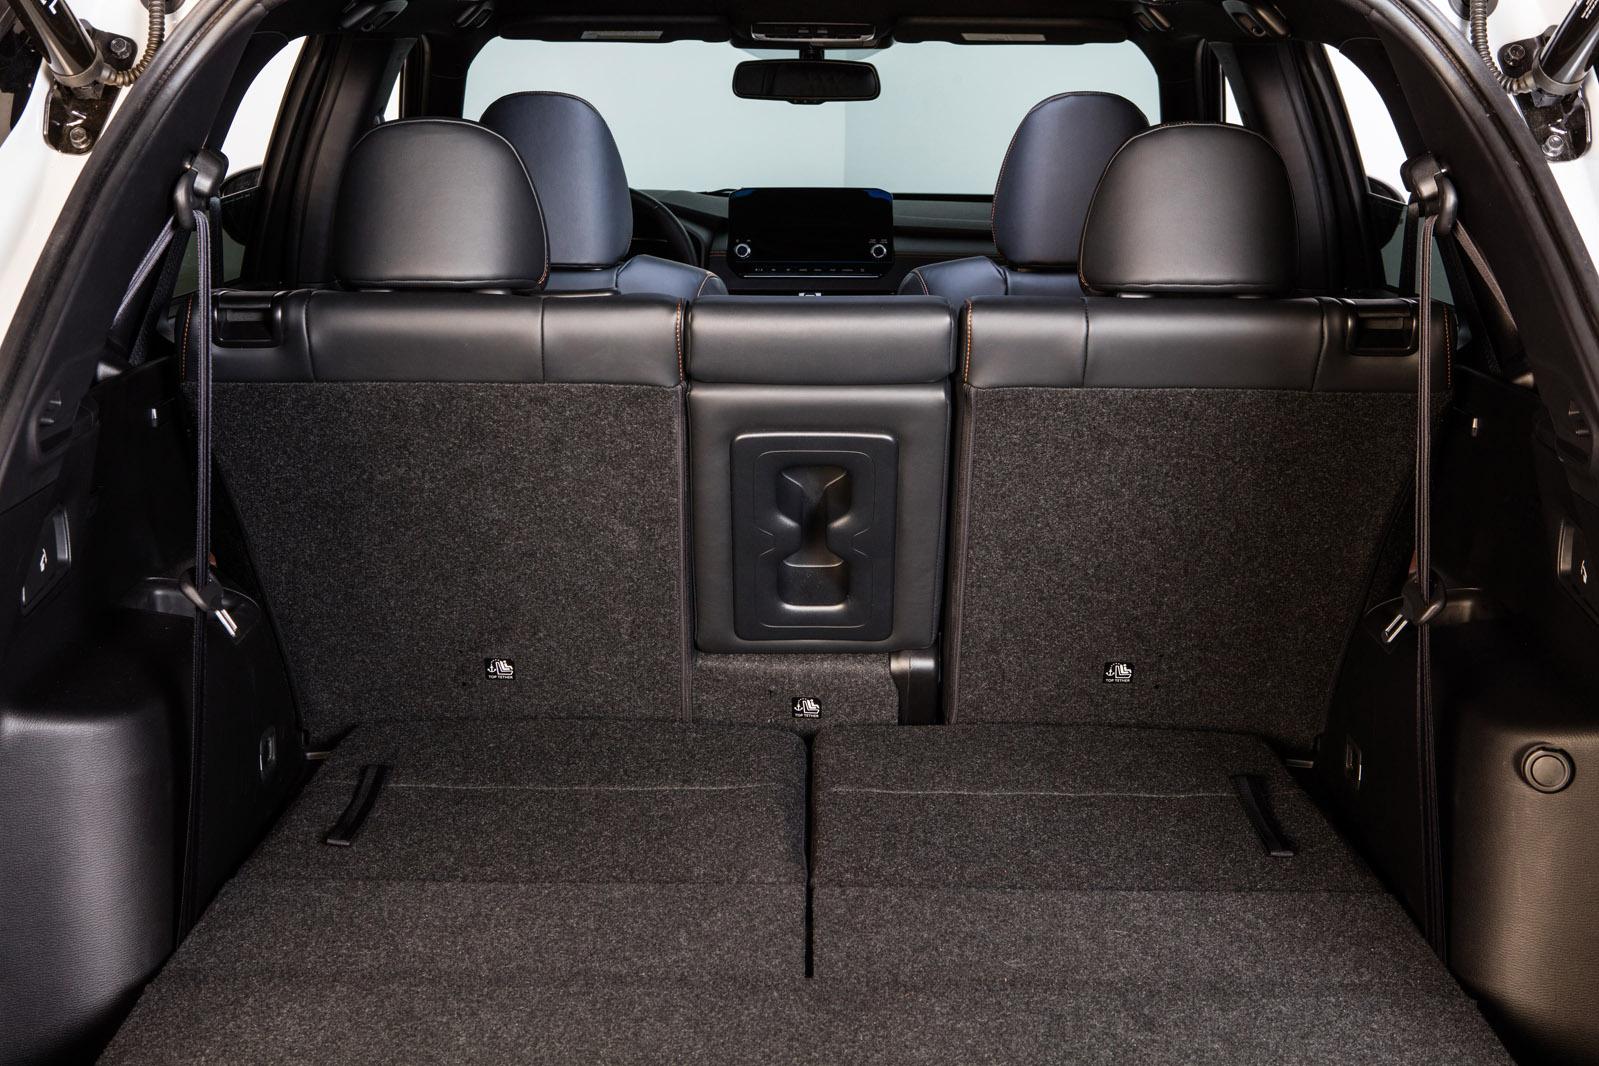 Mitsubishi Outlander Trunk Space